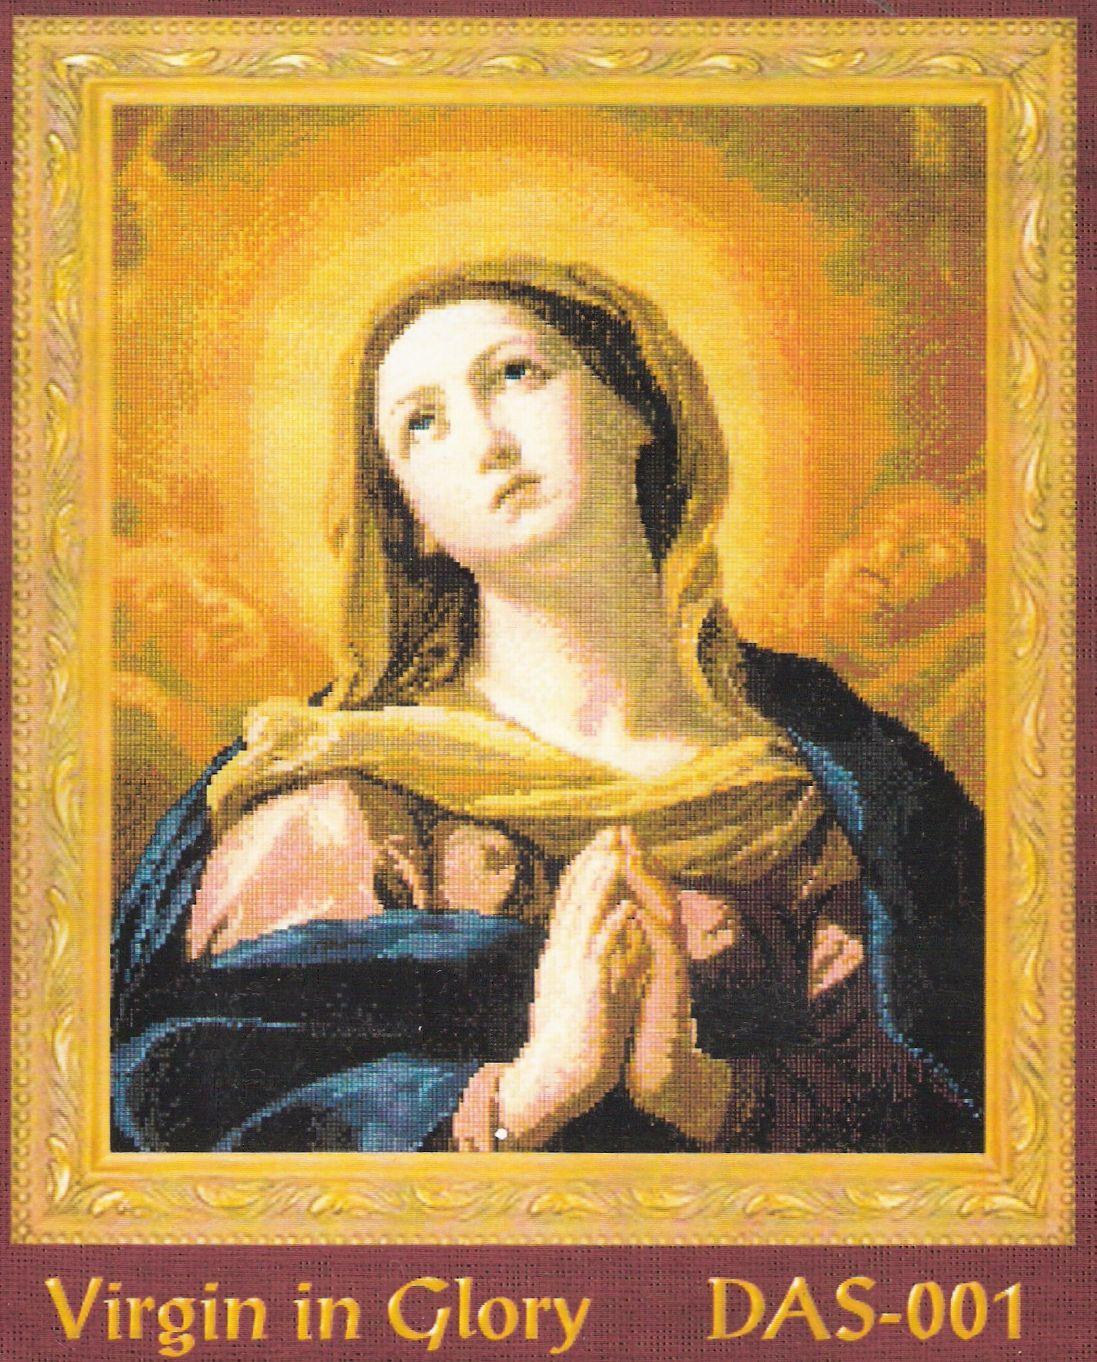 Madonna - Virgin in Glory